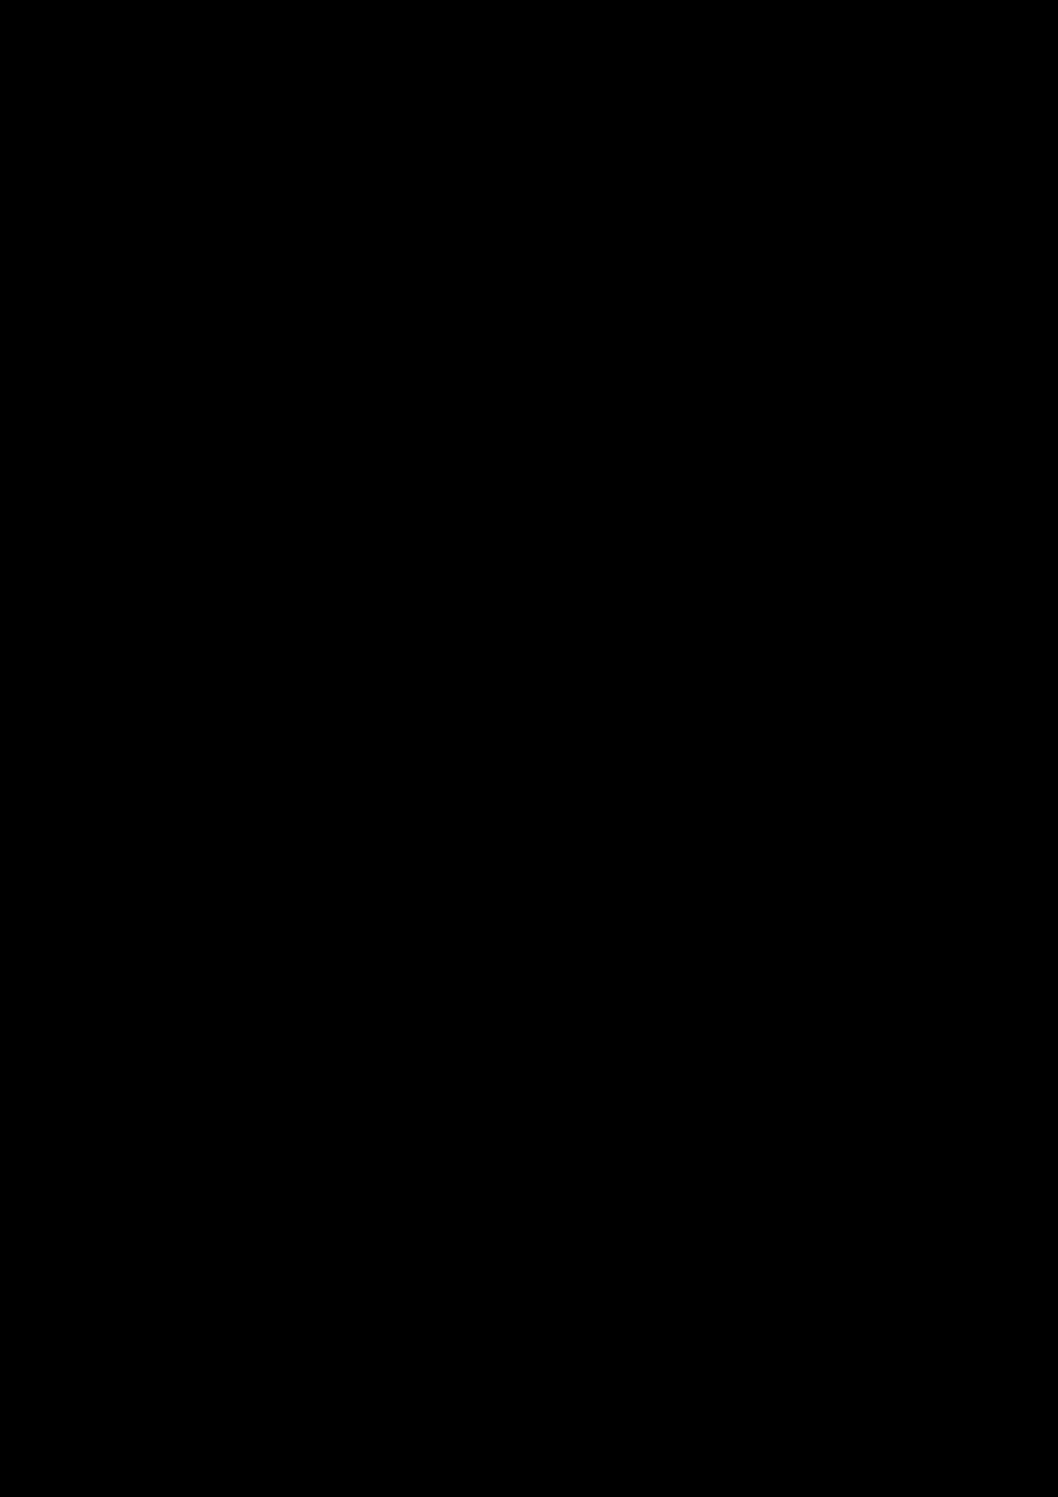 dp0778